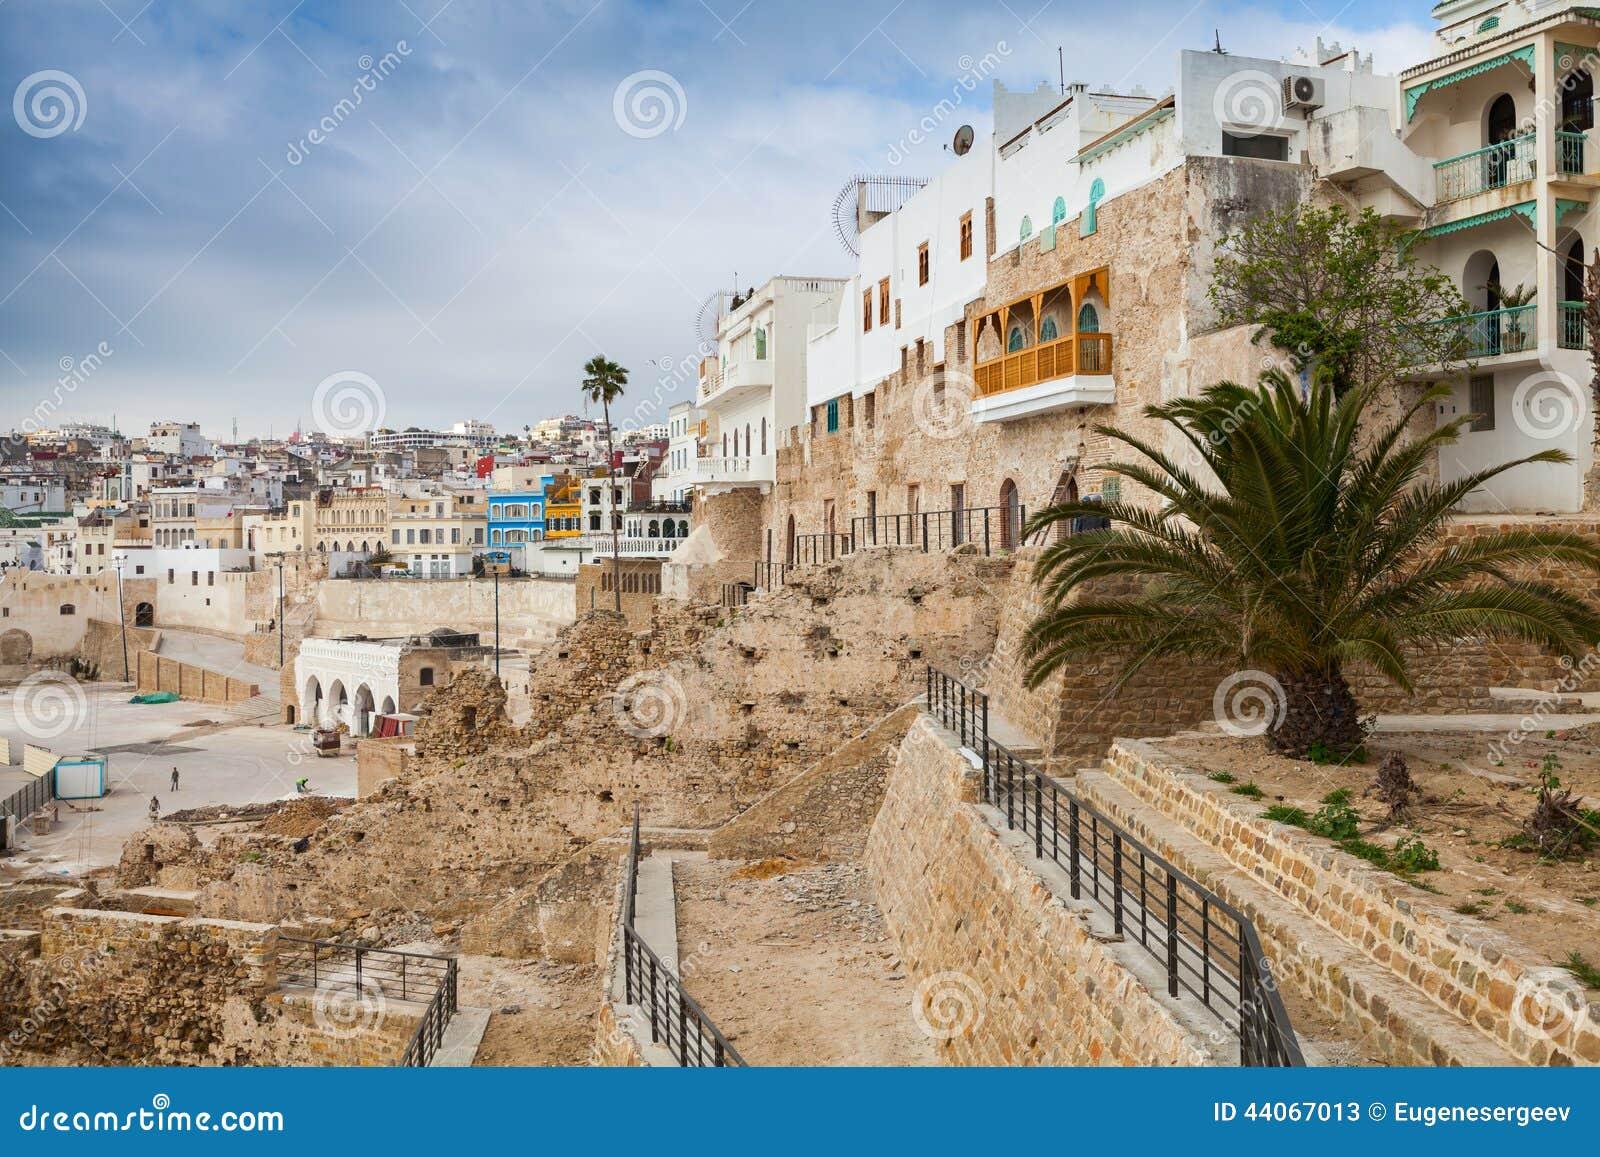 alte w nde und h user in medina tangier marokko stockfoto bild 44067013. Black Bedroom Furniture Sets. Home Design Ideas